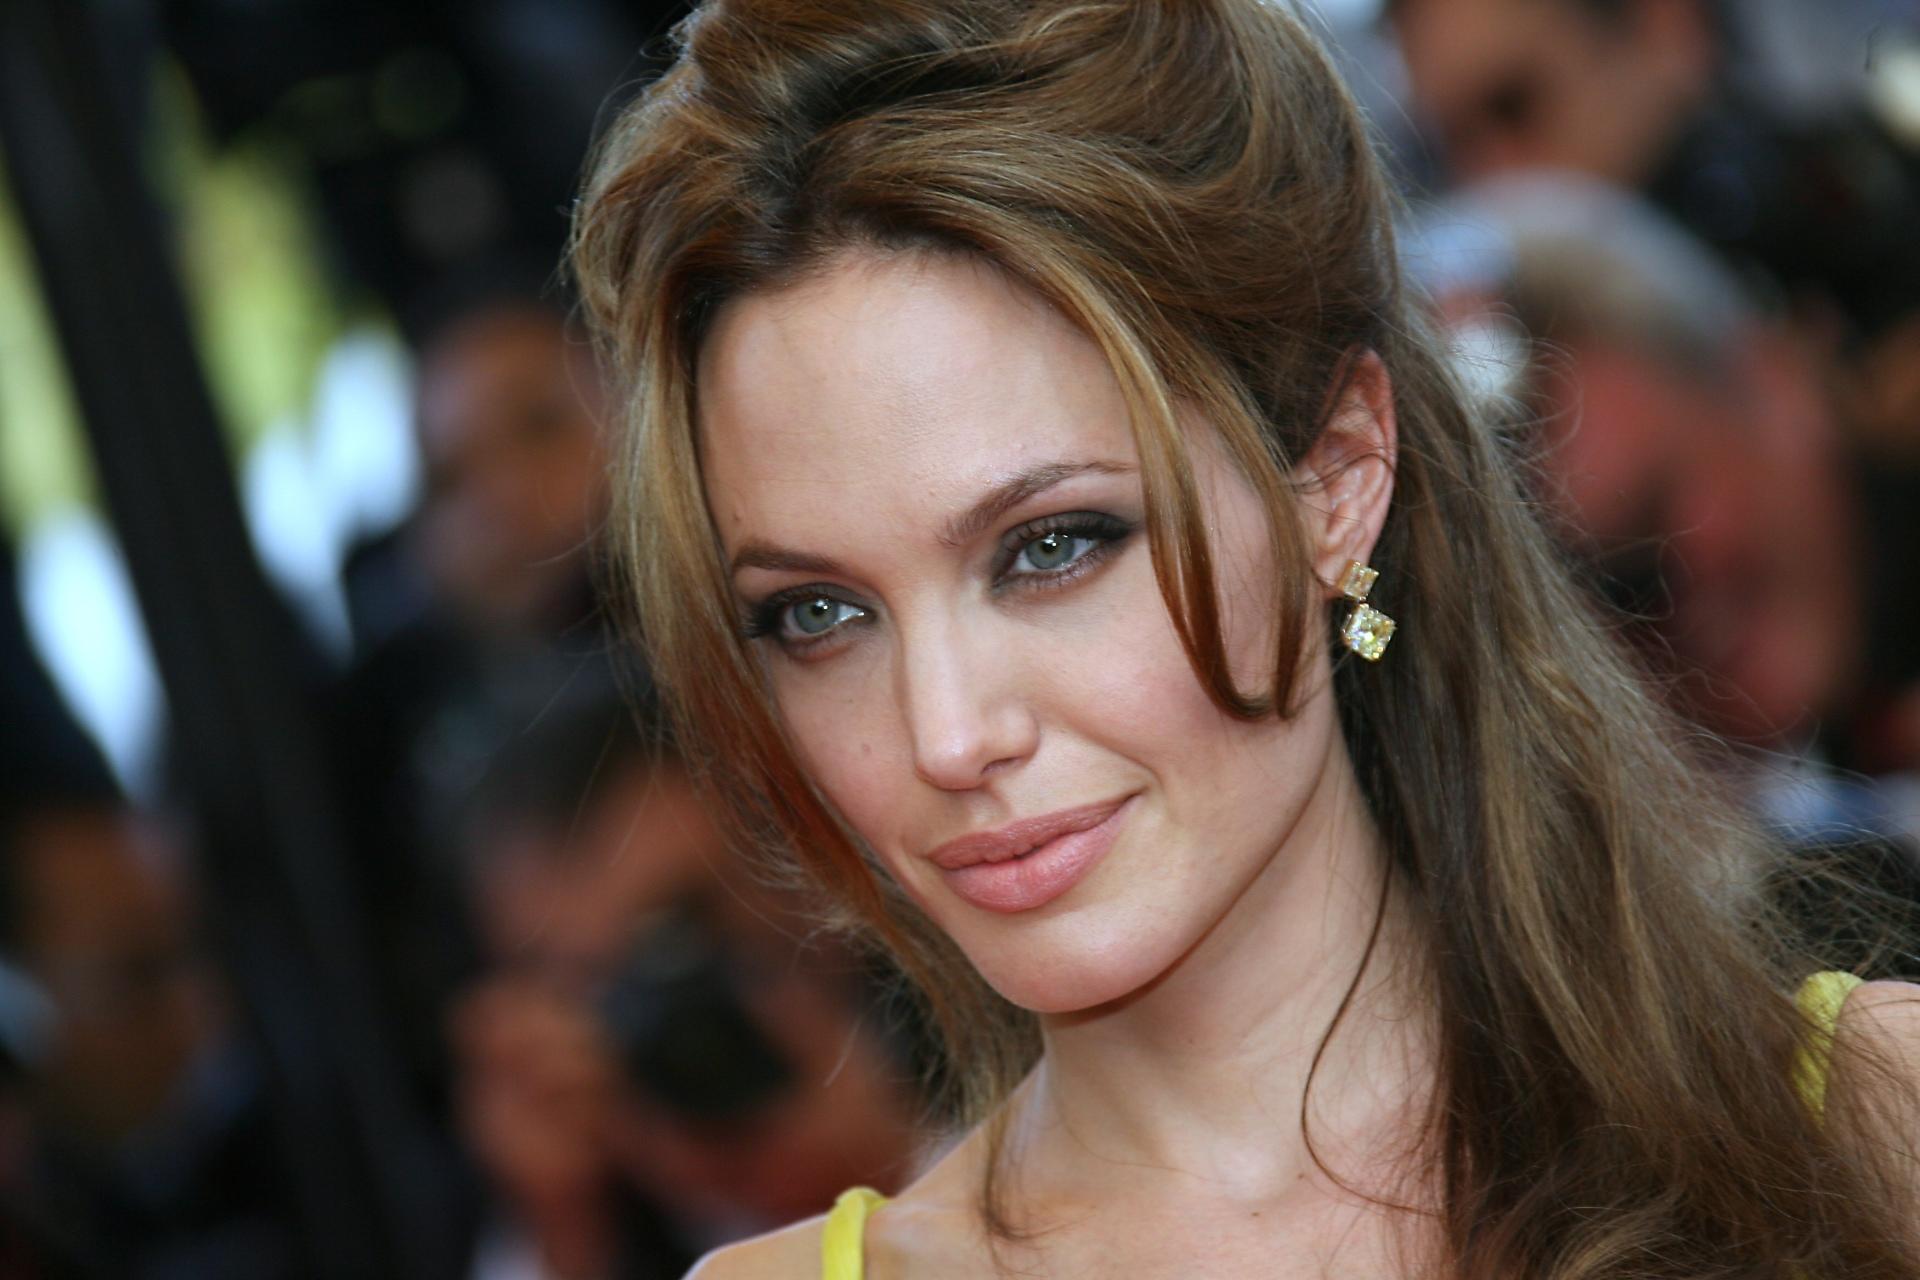 Angelina jolie ver foto chica desnuda gratis 7